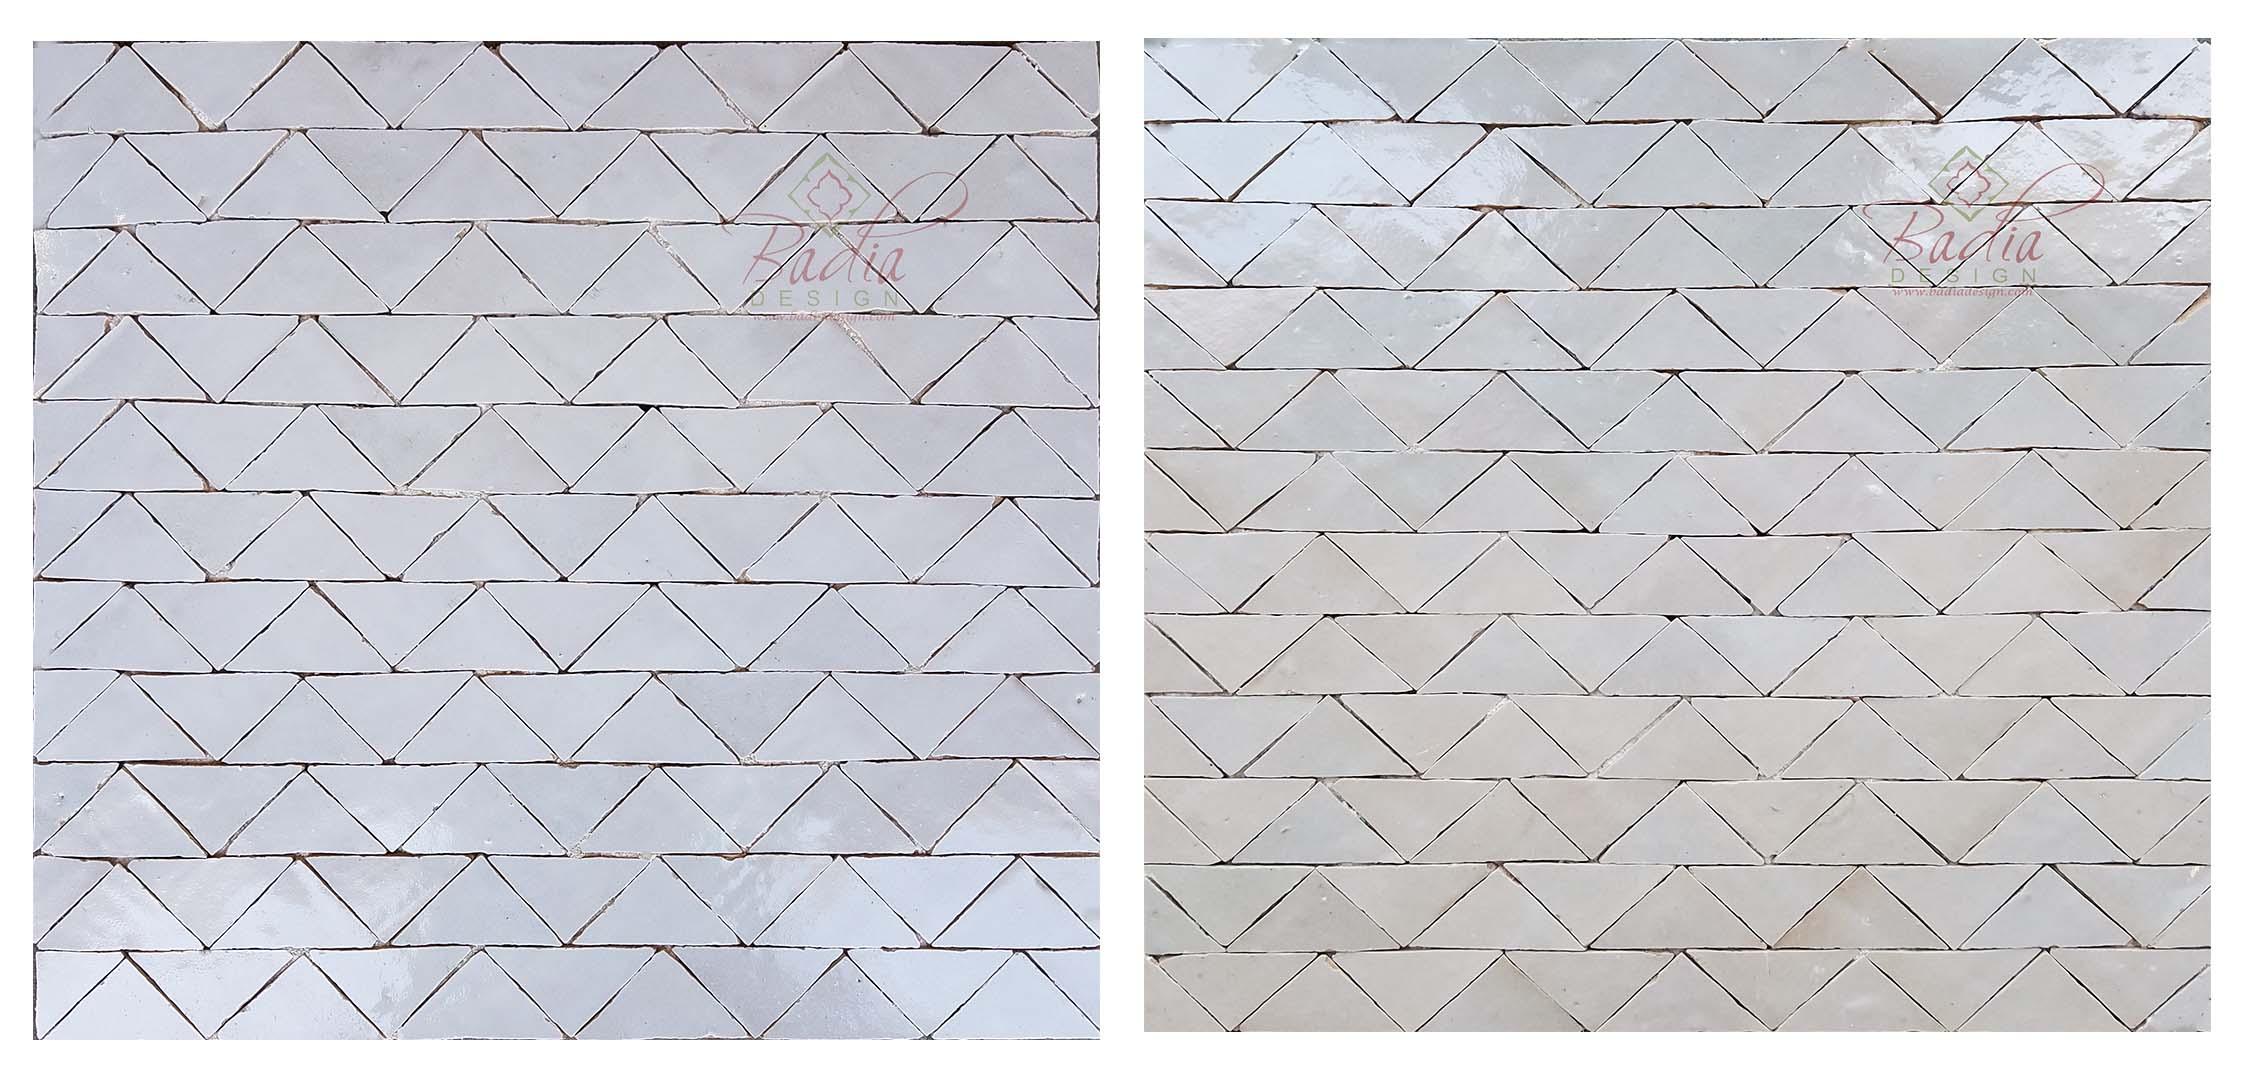 moroccan-mosaic-floor-tiles-tm064.jpg